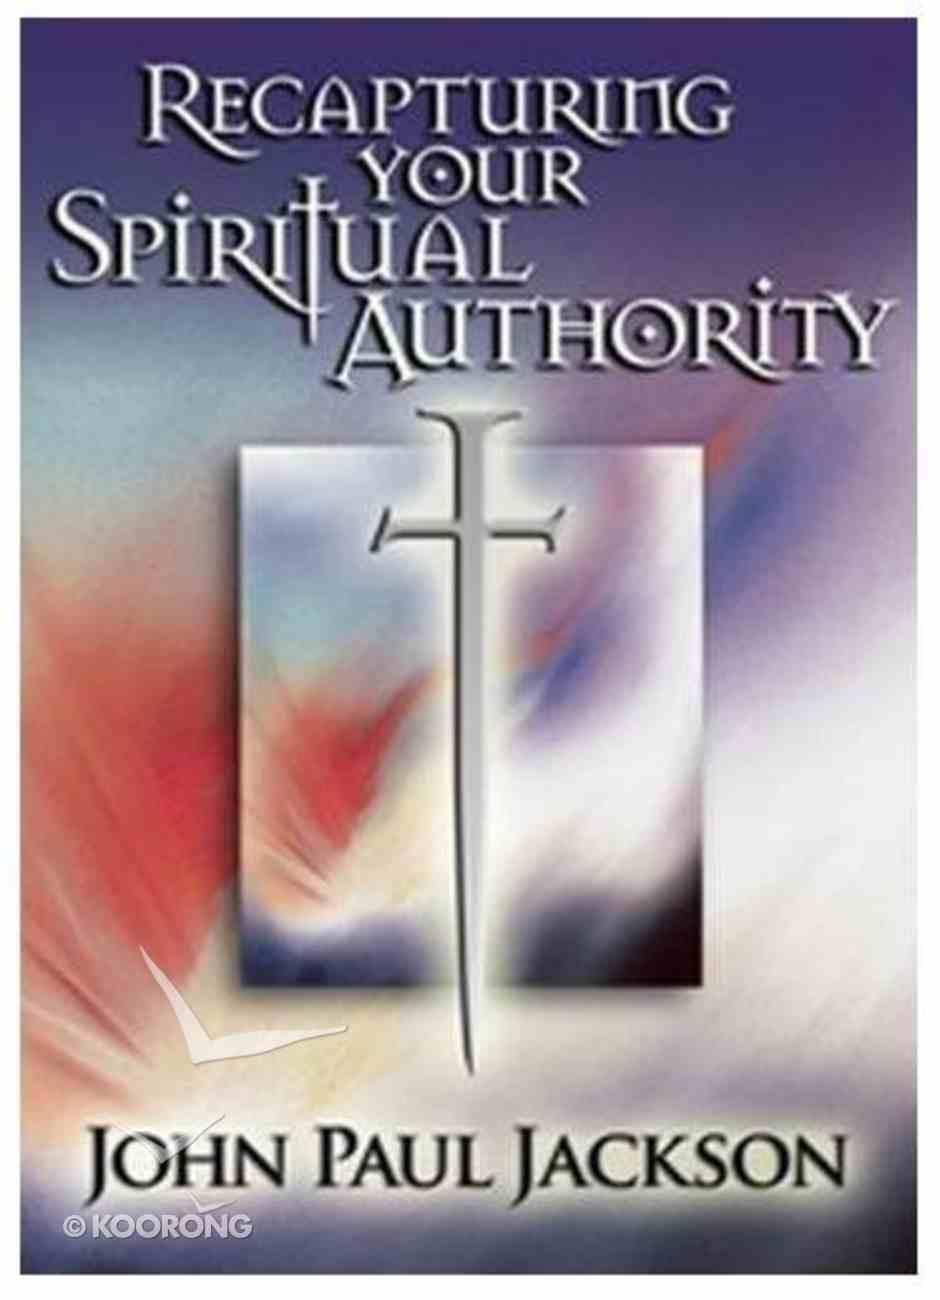 Recapturing Your Spiritual Authority DVD